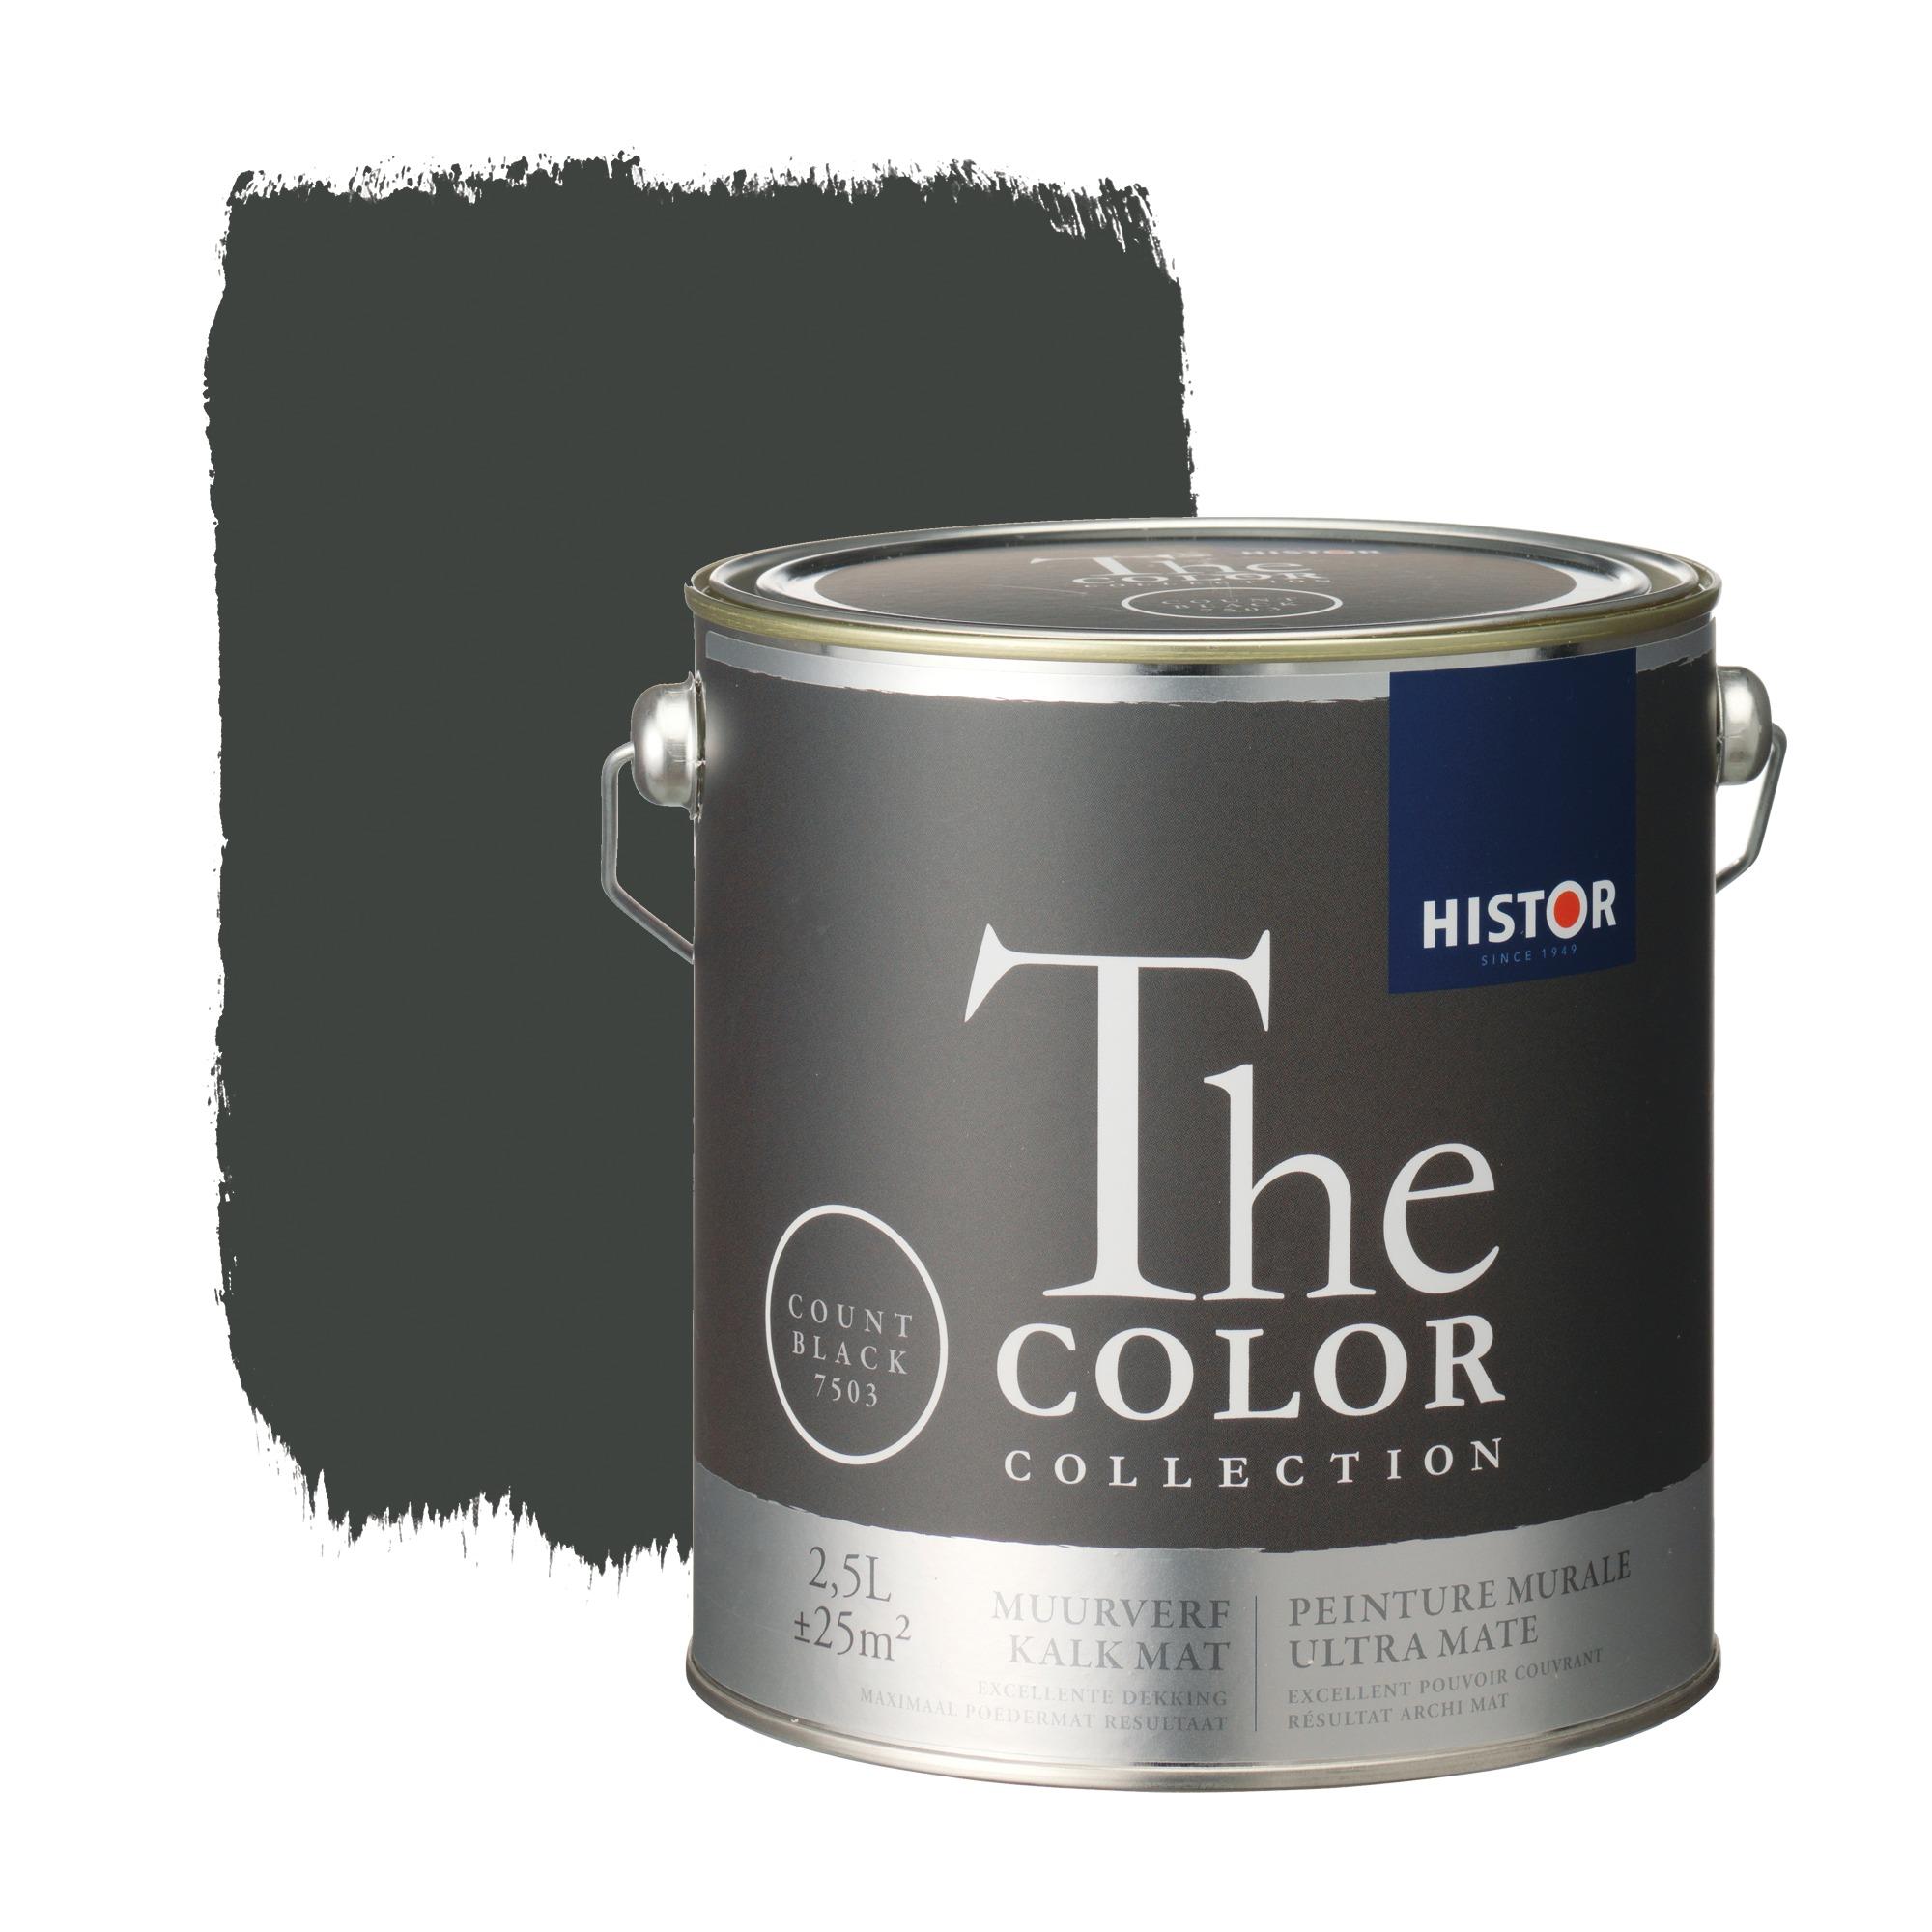 Histor the color collection muurverf kalkmat count black 7503 2,5 l